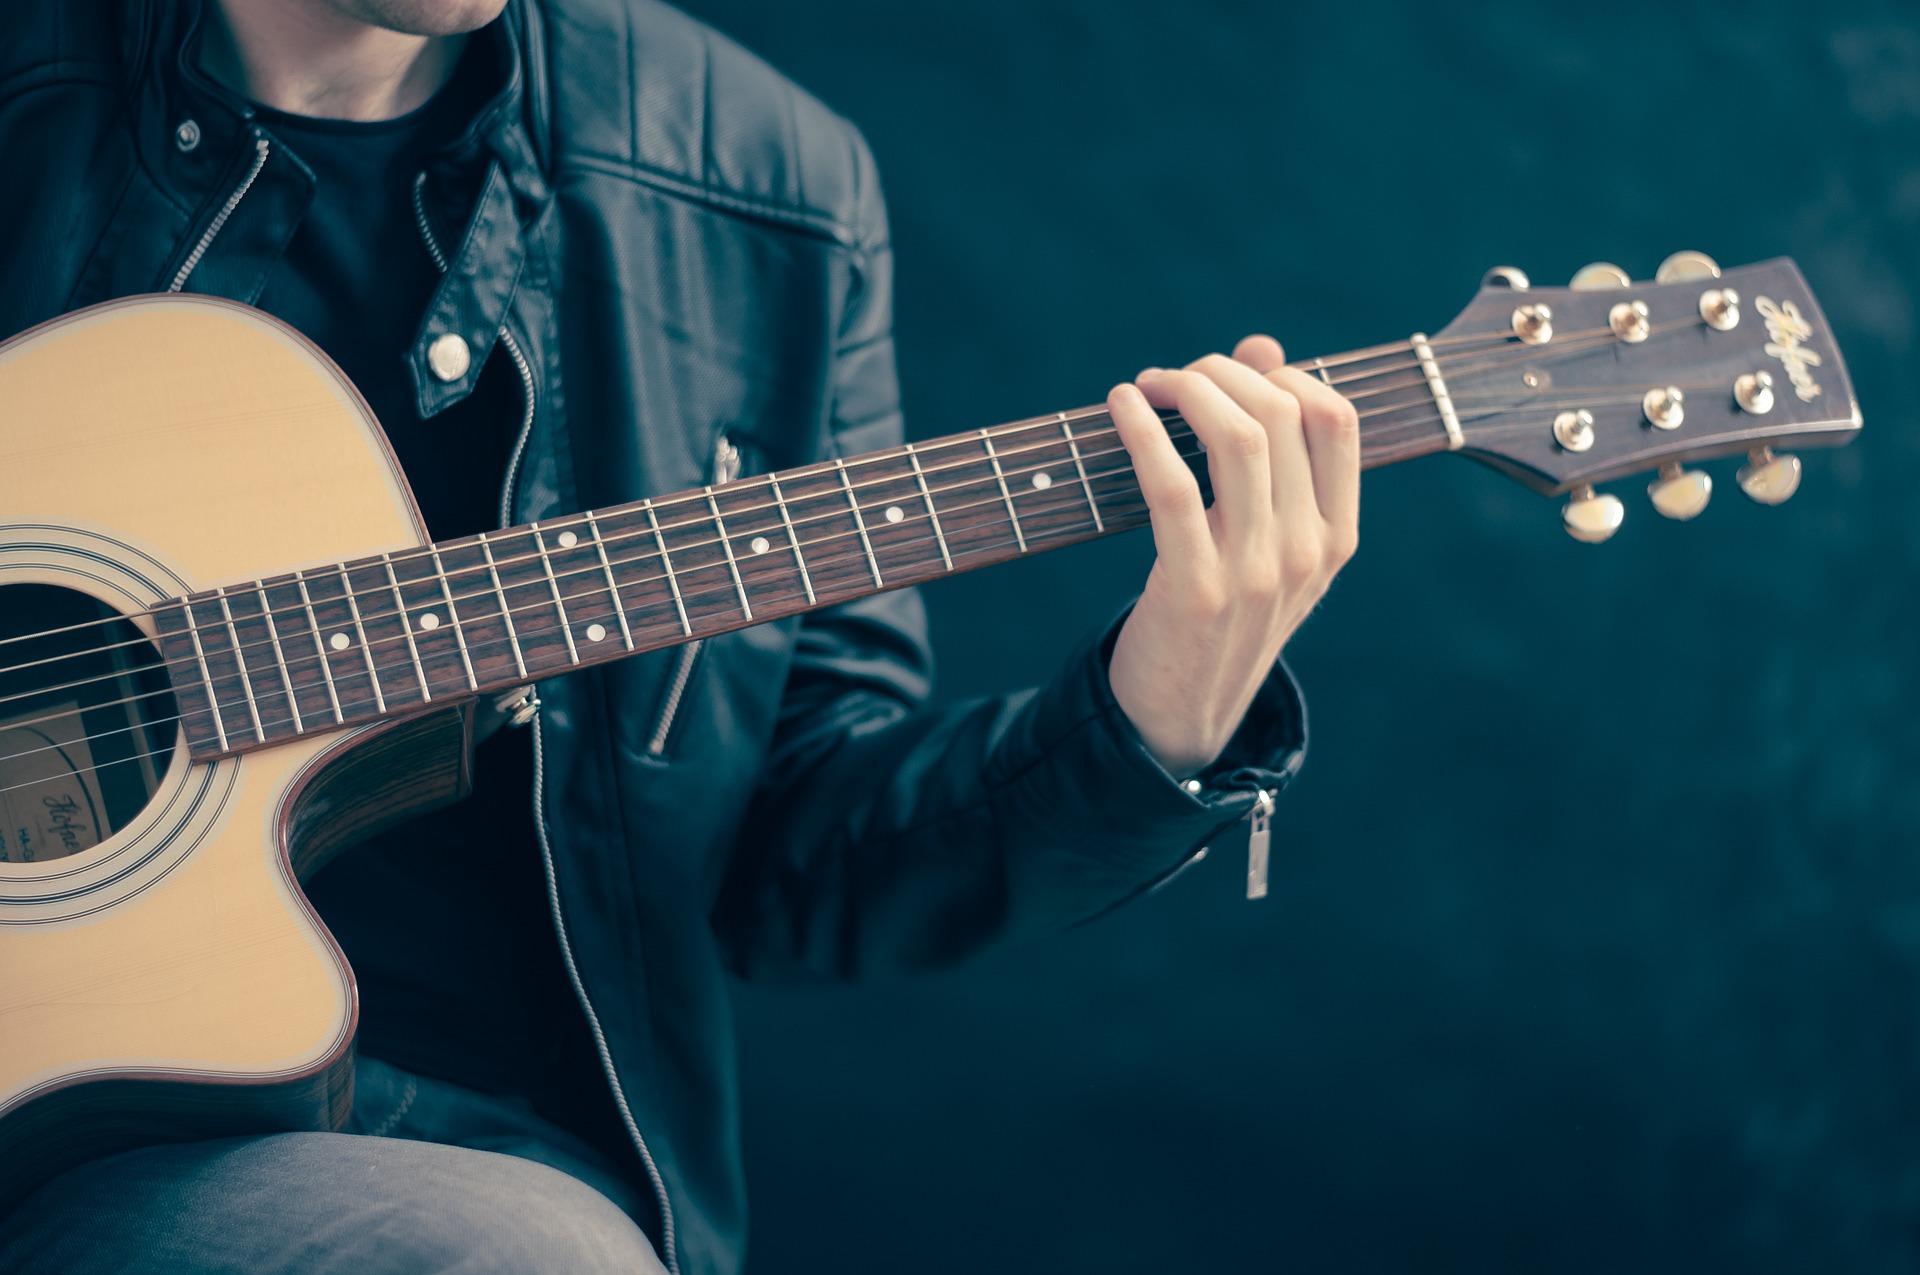 gitarr, livemusik, event, fri entré, gigg, staffanstorps gästis